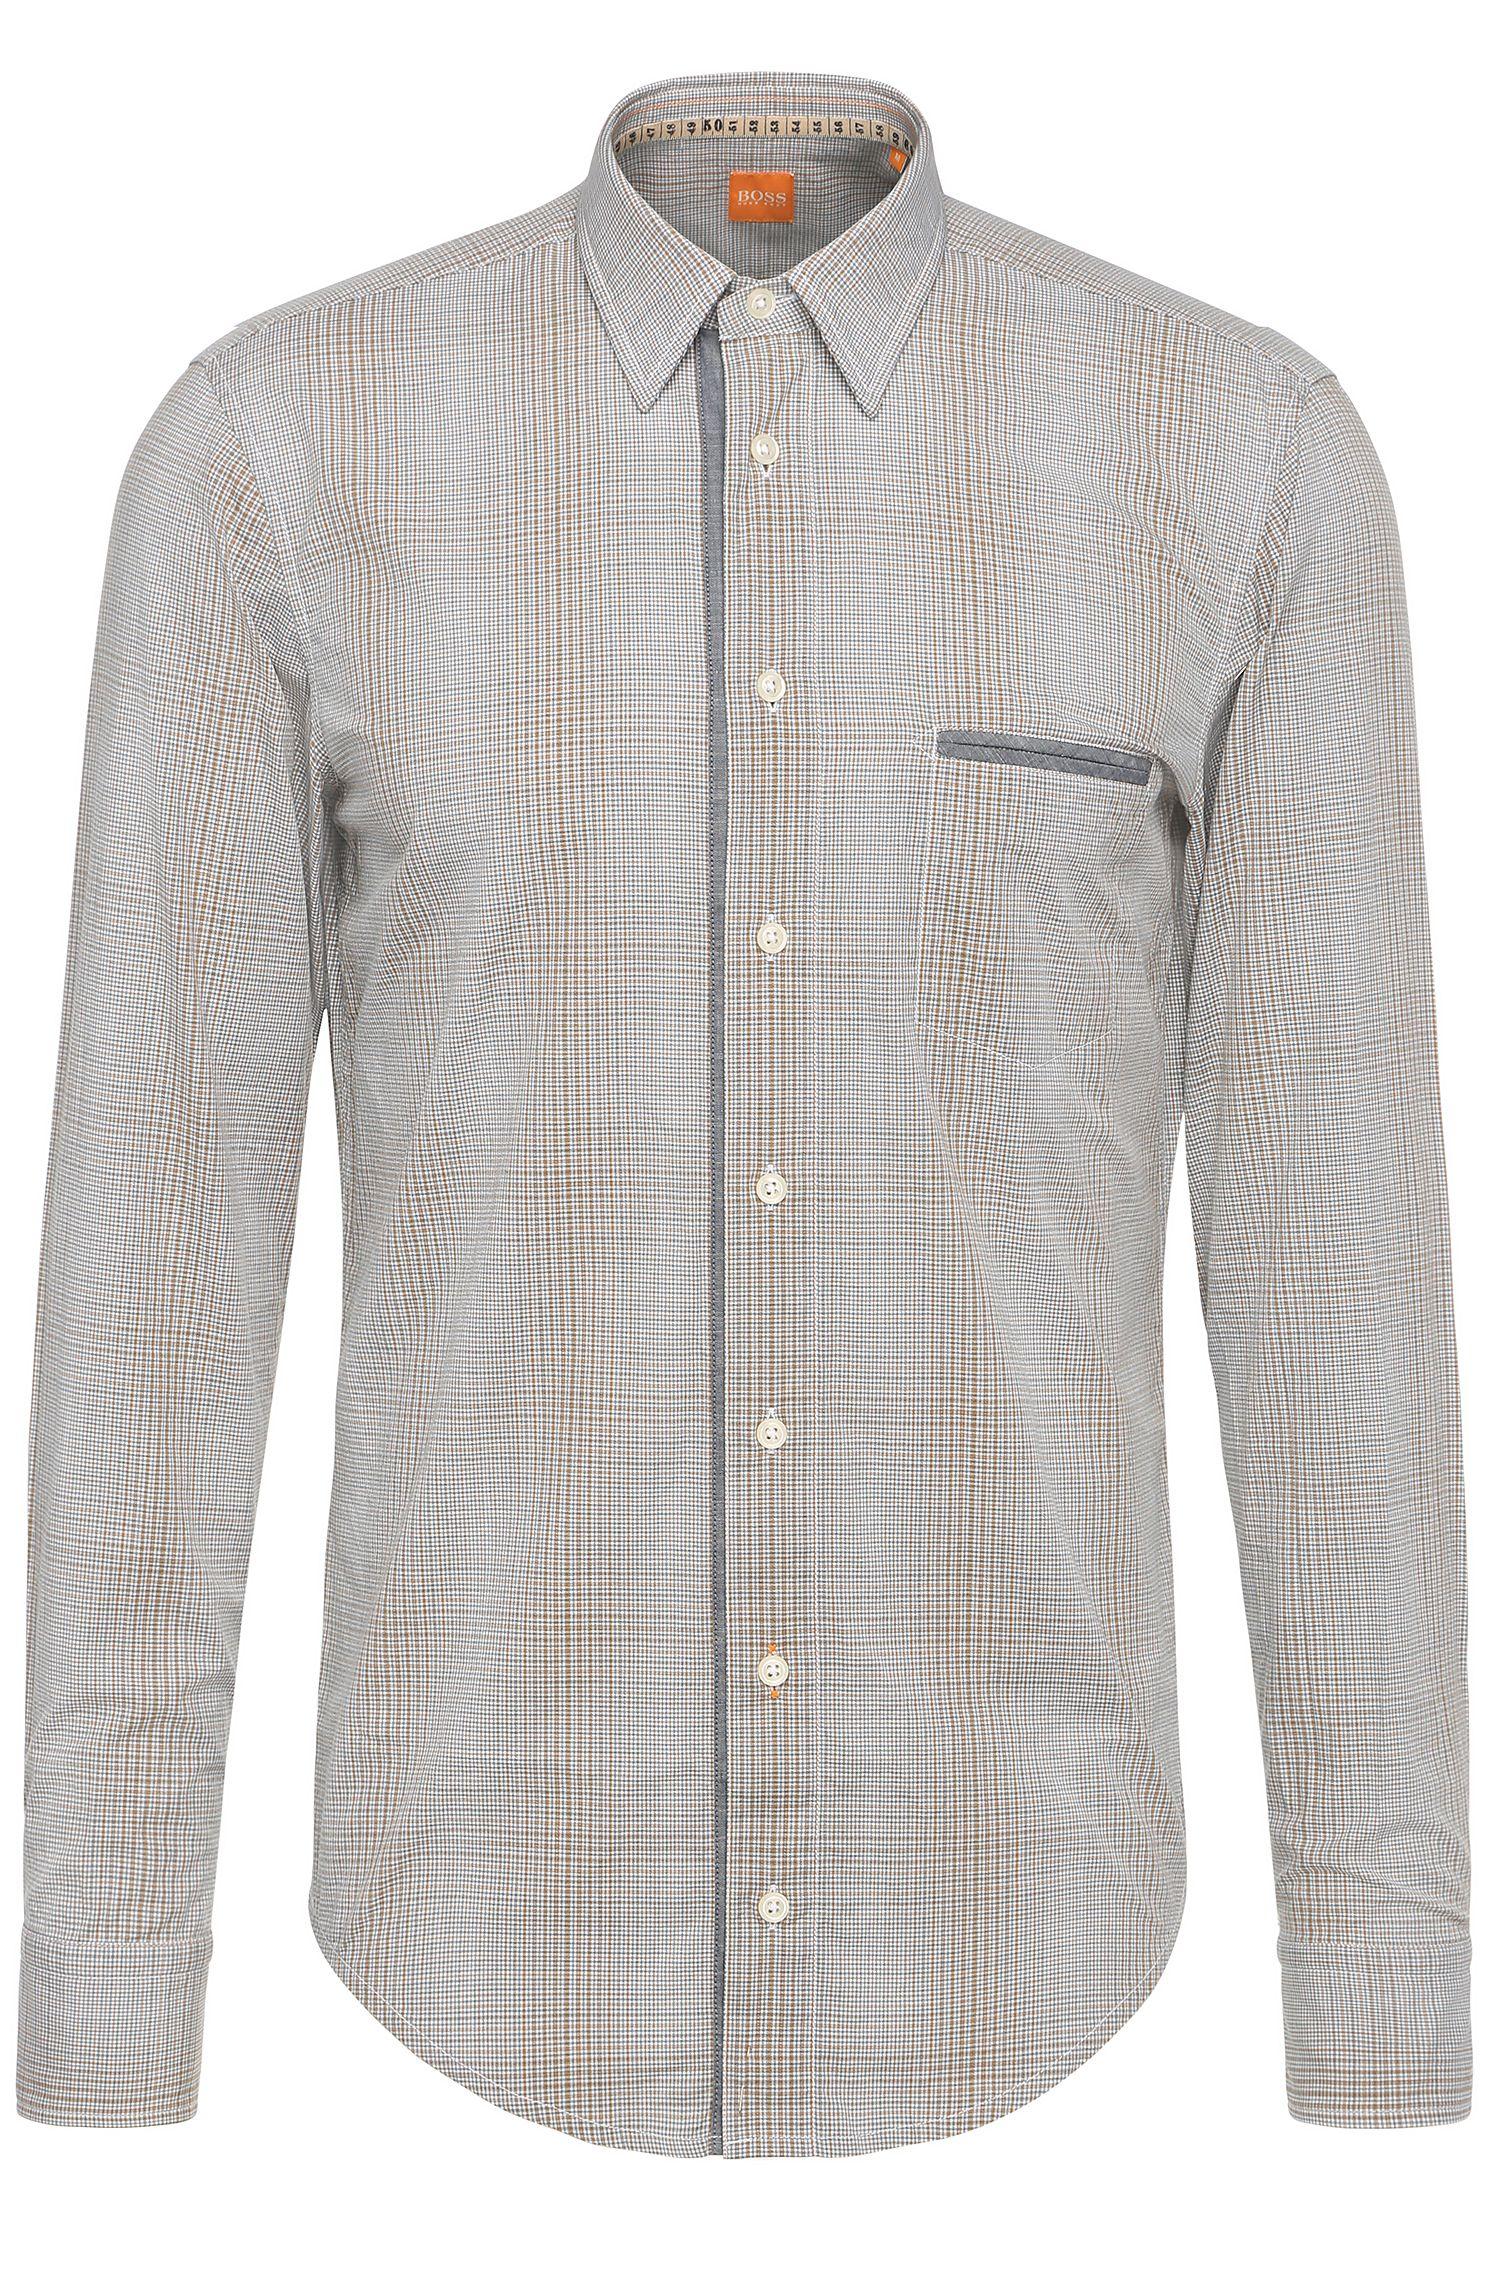 'CieloebuE'   'Slim Fit, Cotton Button Down Shirt